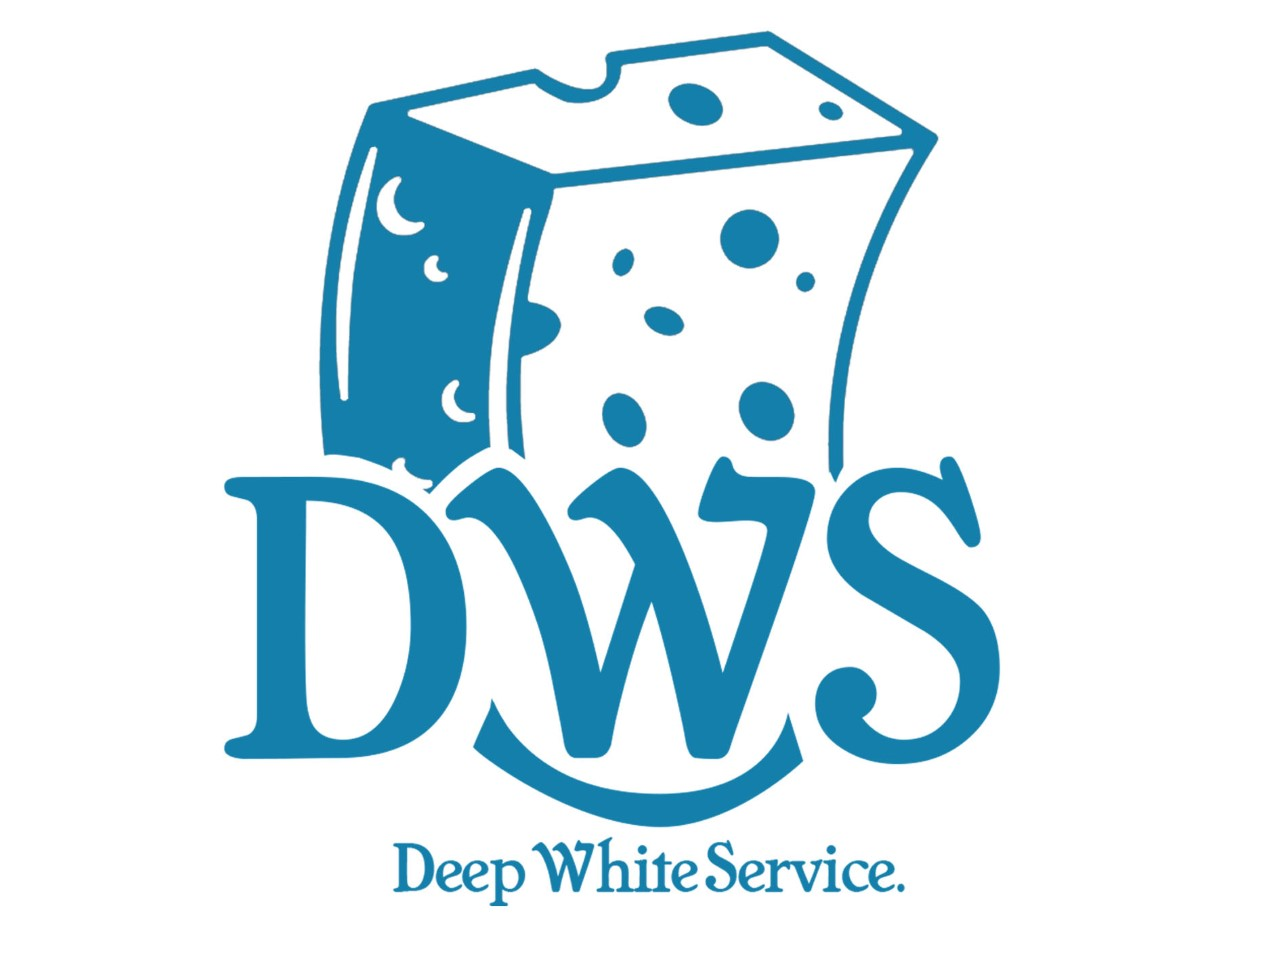 Deep White Service